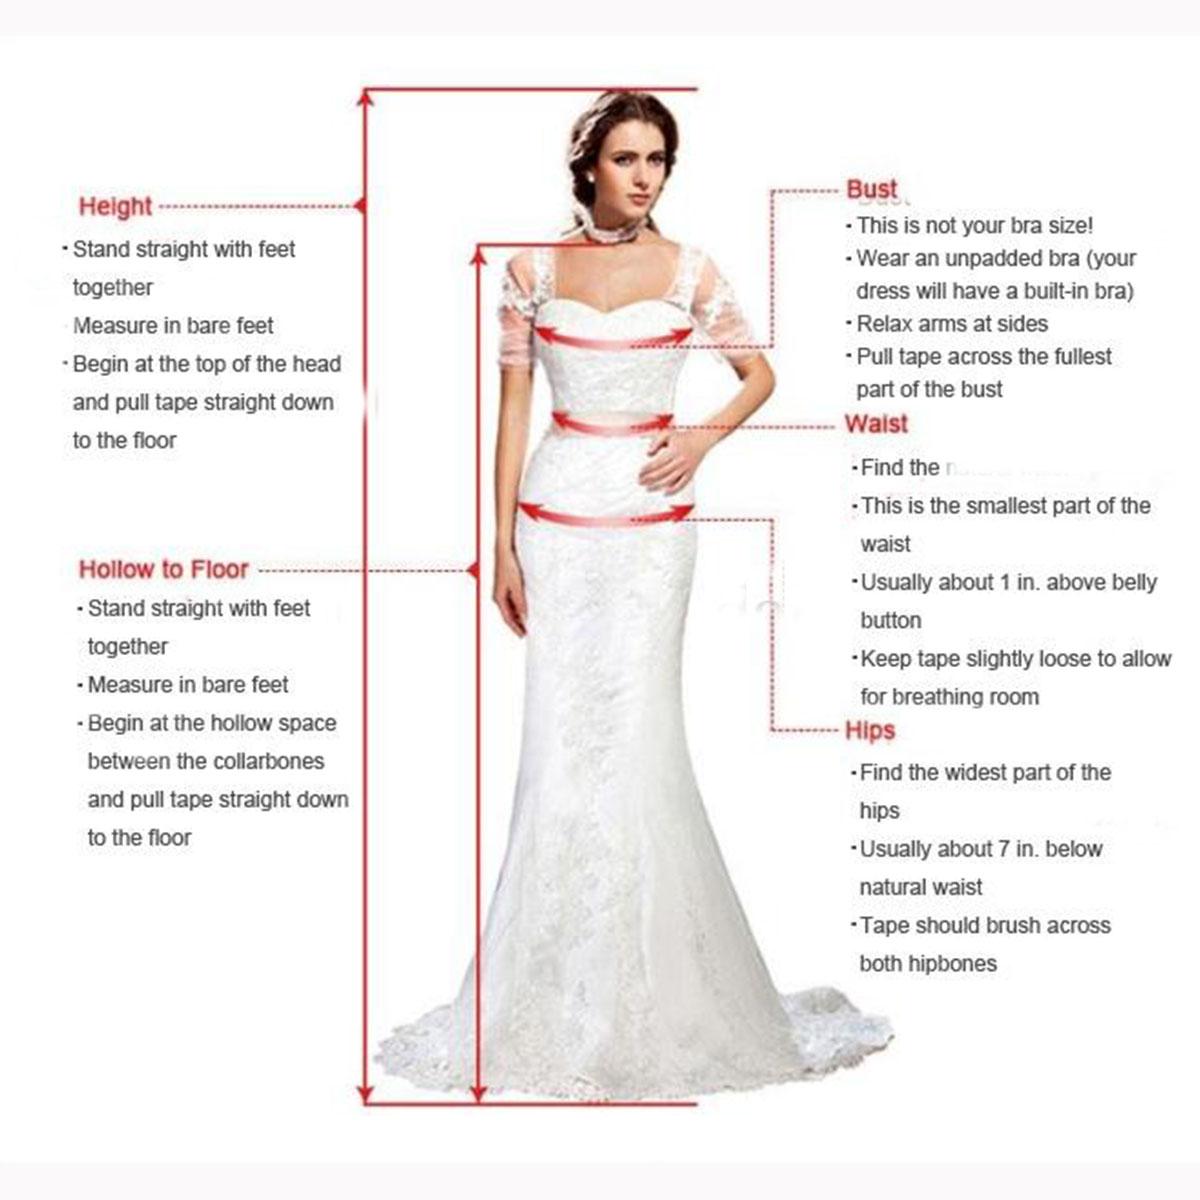 e074f2153ff03 ... White chiffon v-neck open back sexy long evening dress - Thumbnail 2 ...